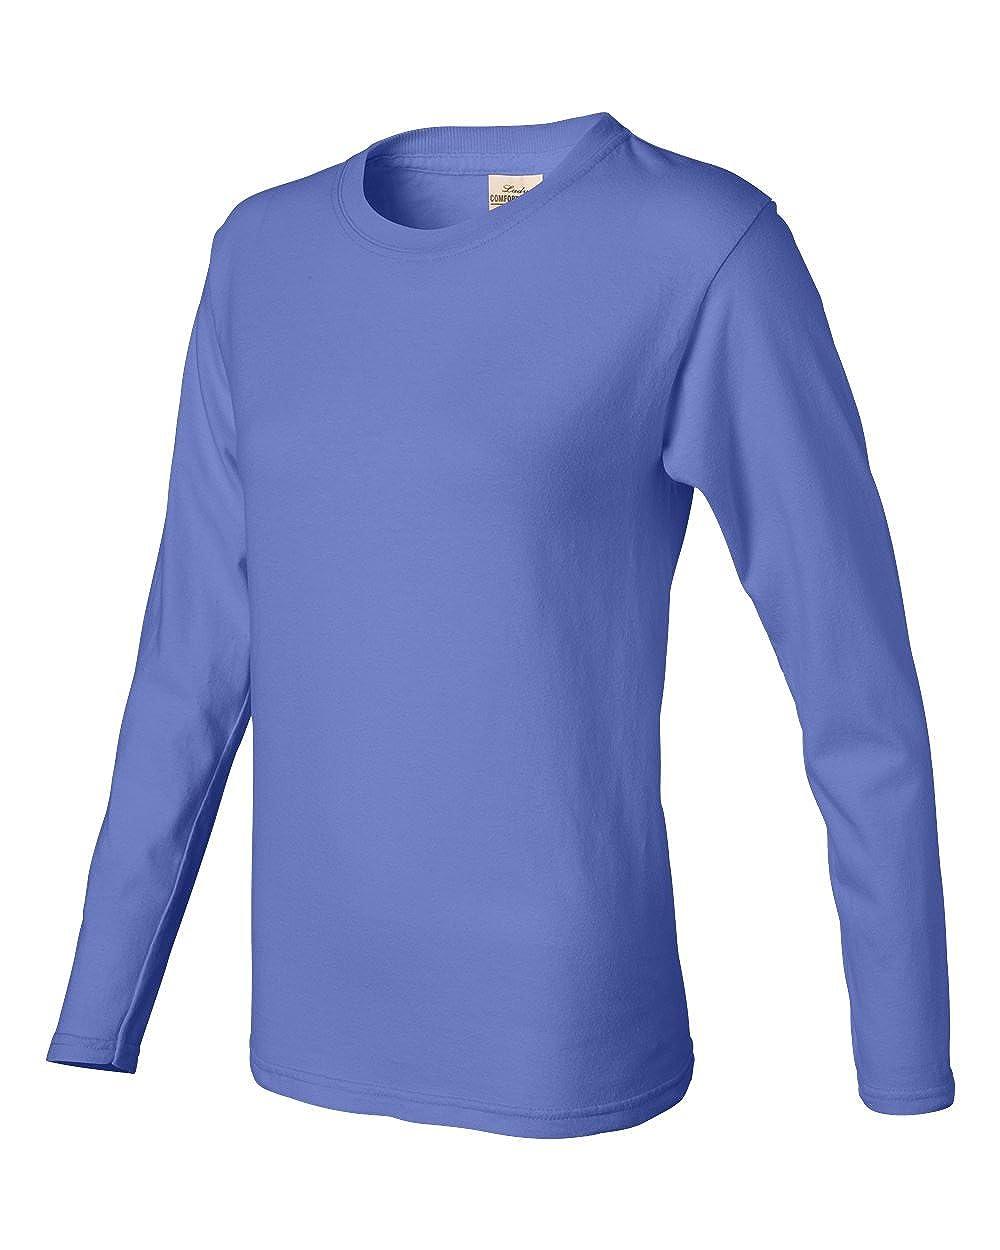 Comfort Colors Womens 5.4 oz Ringspun Garment-Dyed Long Sleeve T-Shirt C3014